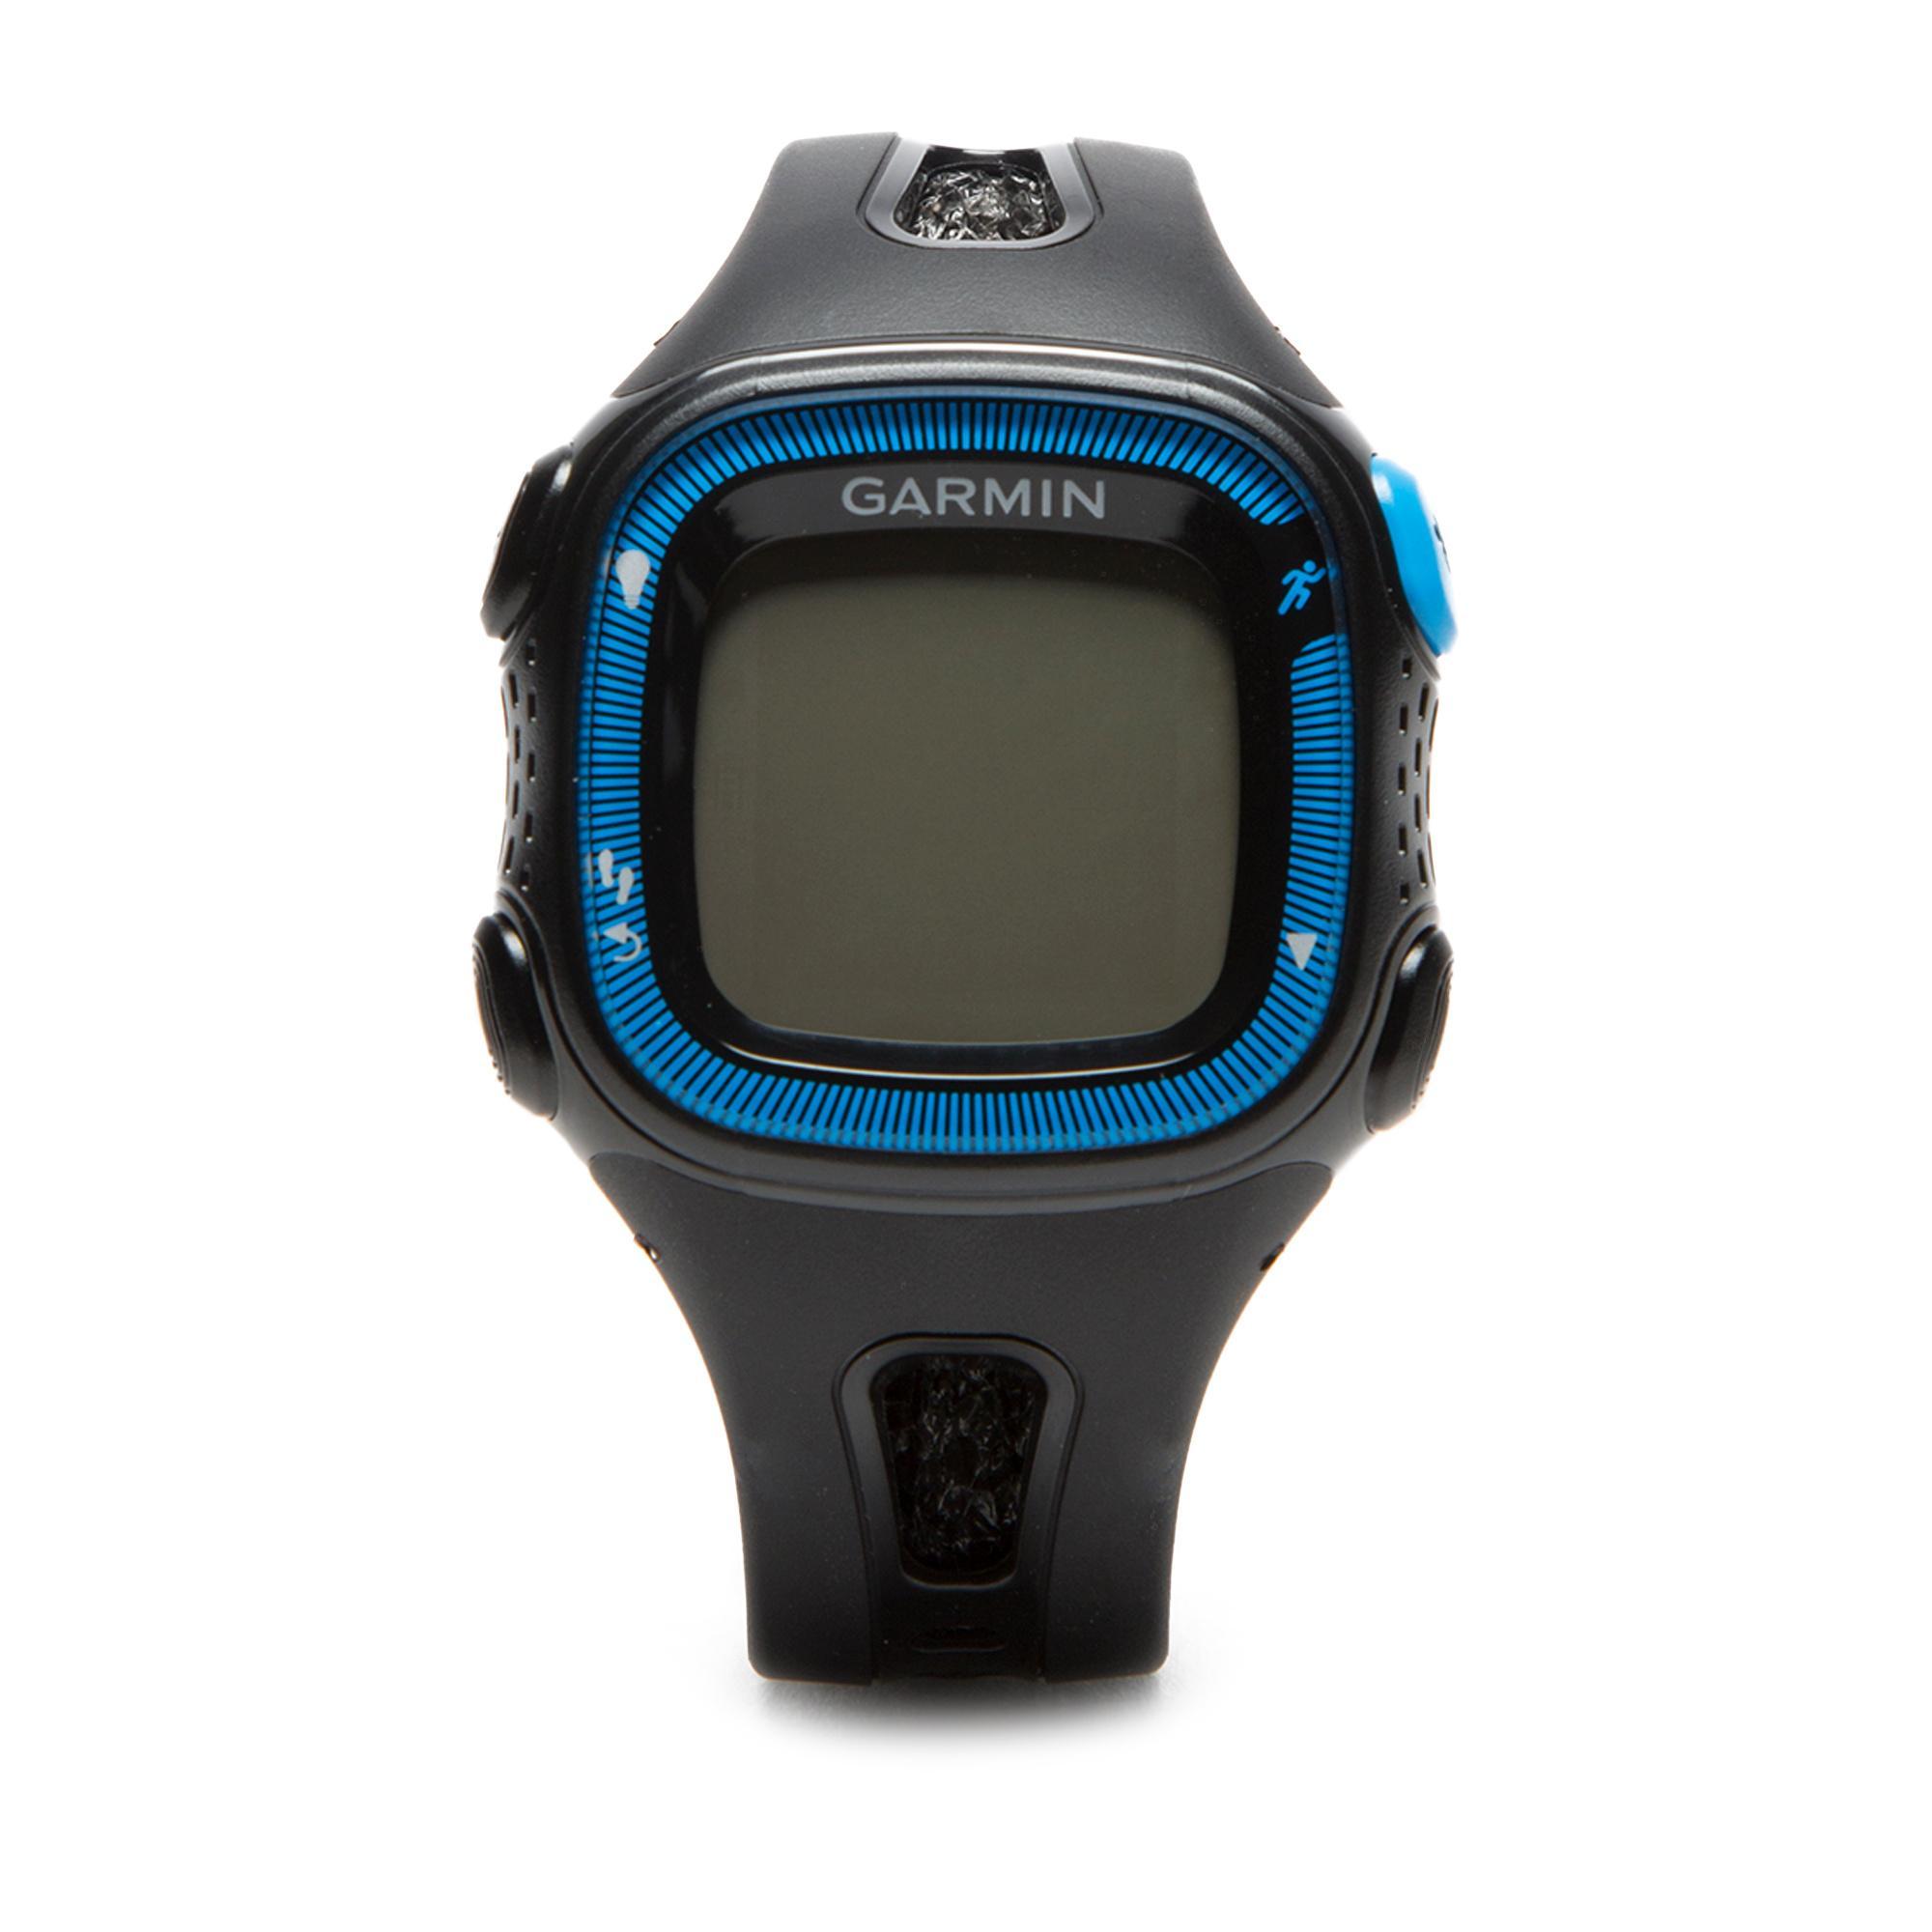 Garmin Forerunner 15 GPS Running Watch with Heart Rate Monitor Black